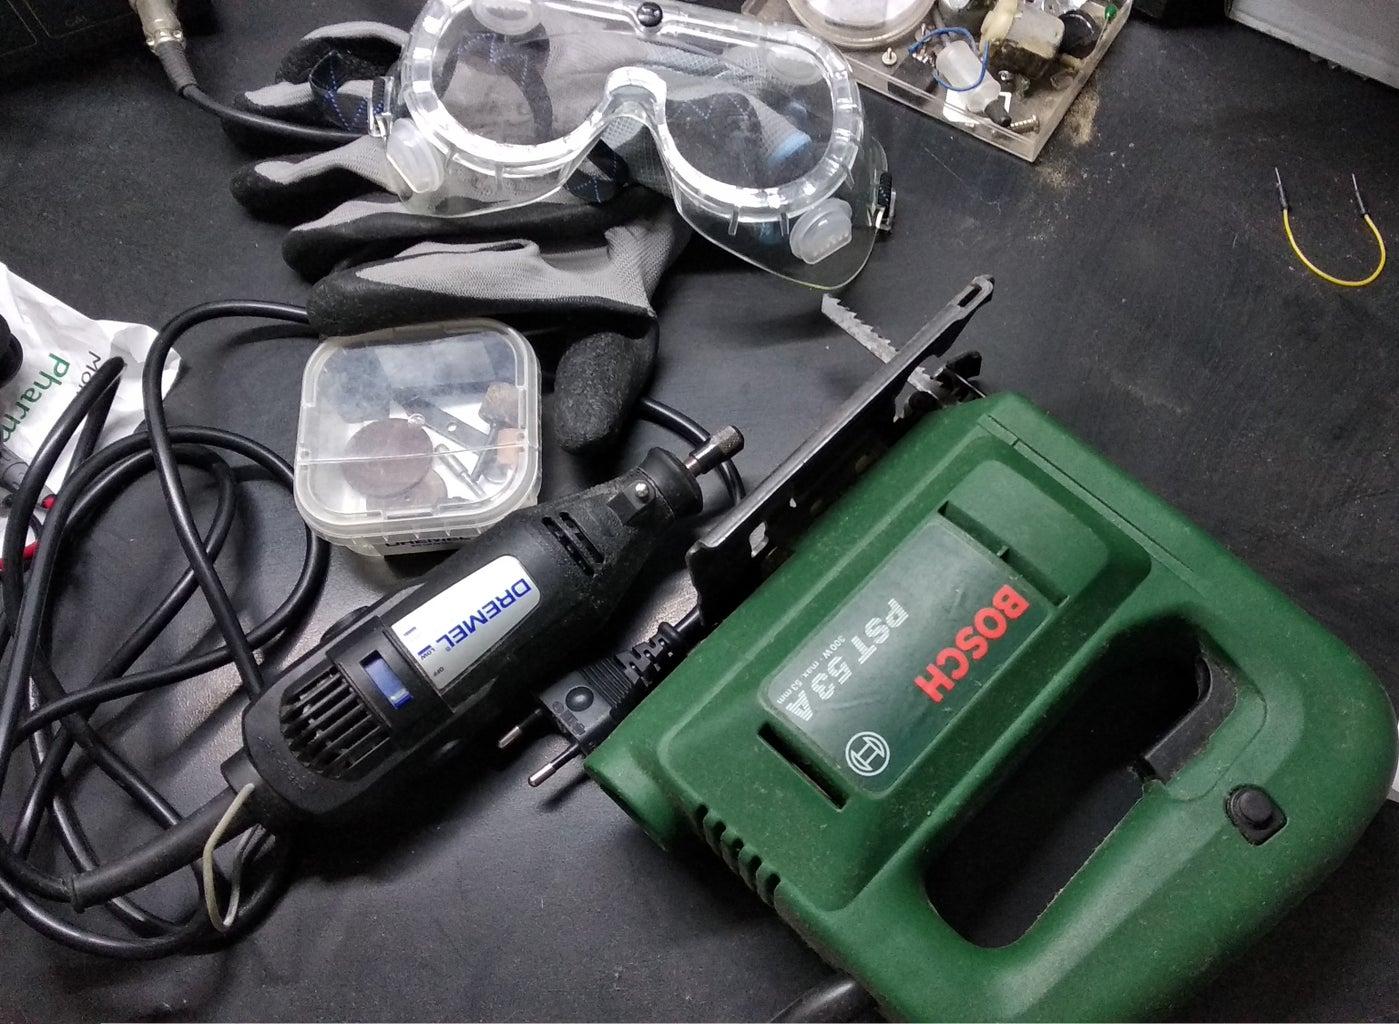 -- Basics for a Home Laboratory (Bonus)